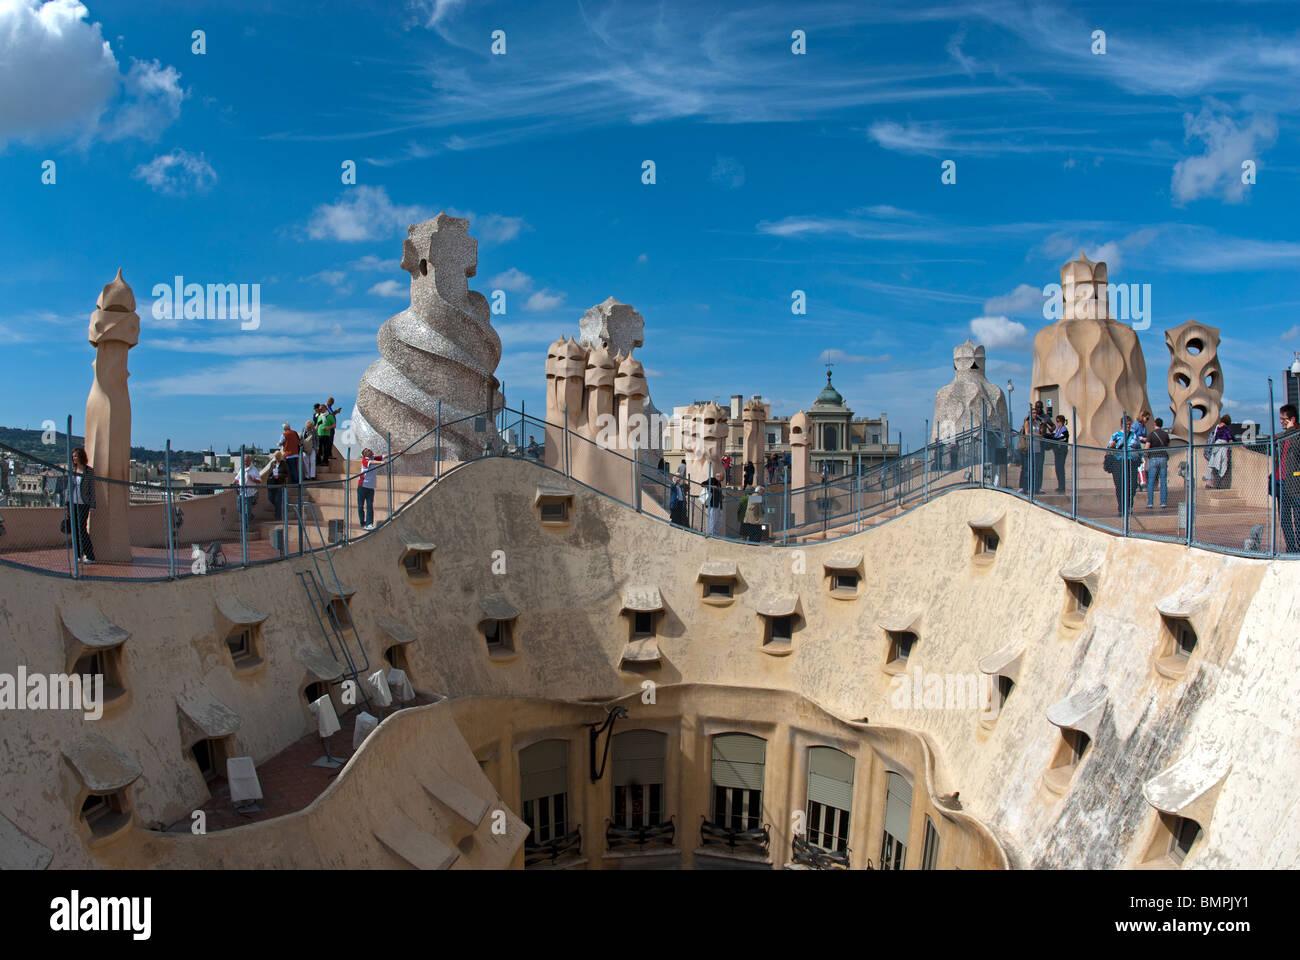 Barcelona, the works of Gaudi – Frontrange Imaging |Casa Mila Roof